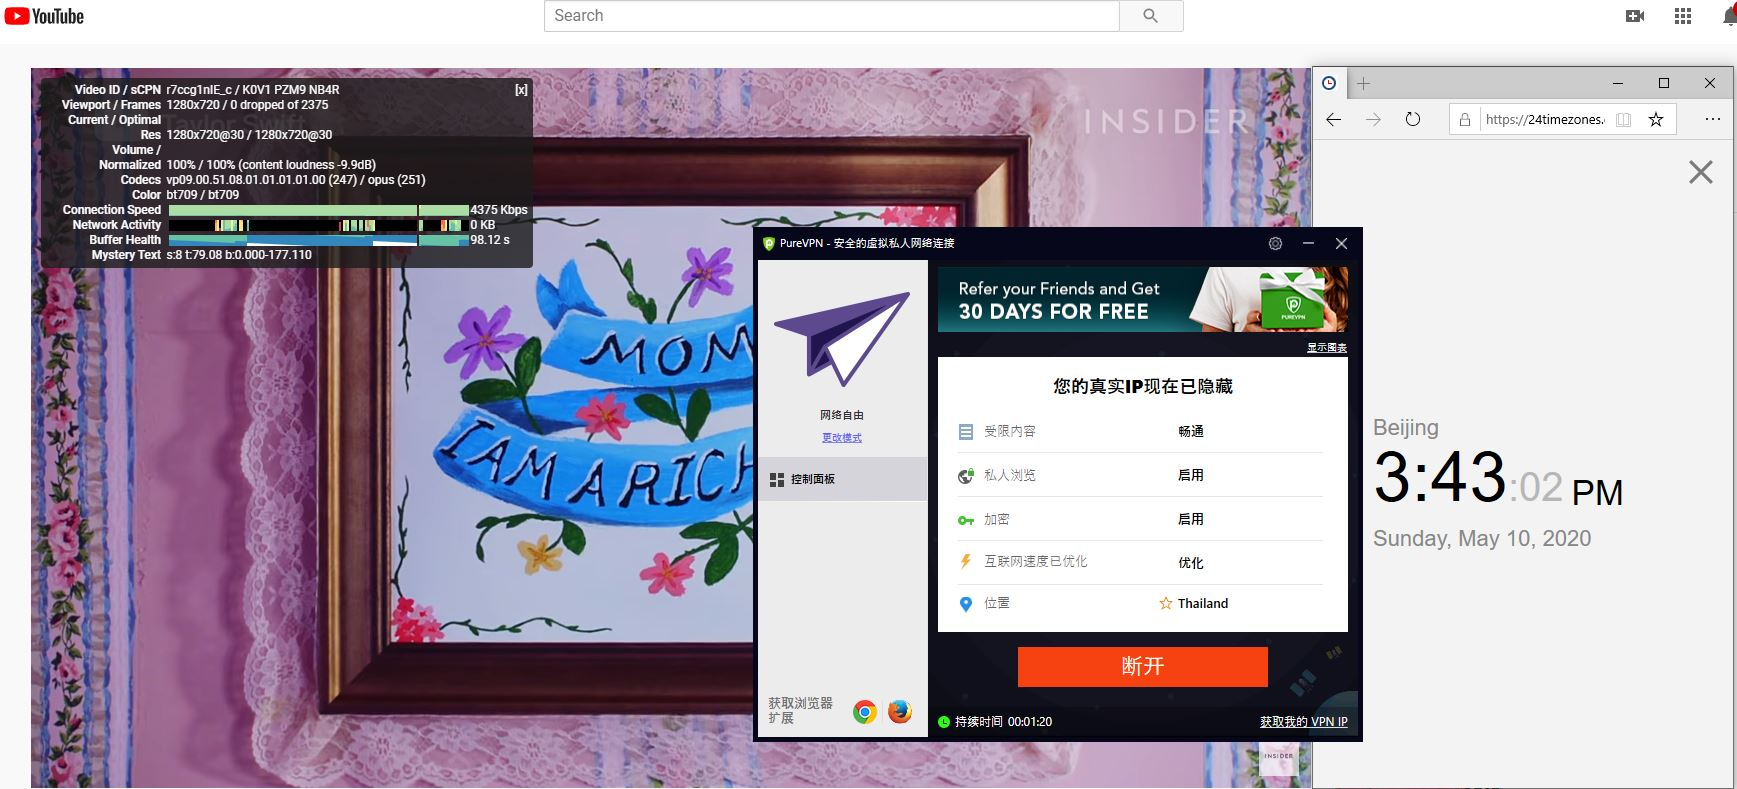 Windows10 PureVPN Canada 中国VPN 翻墙 科学上网 youtube测速-20200510